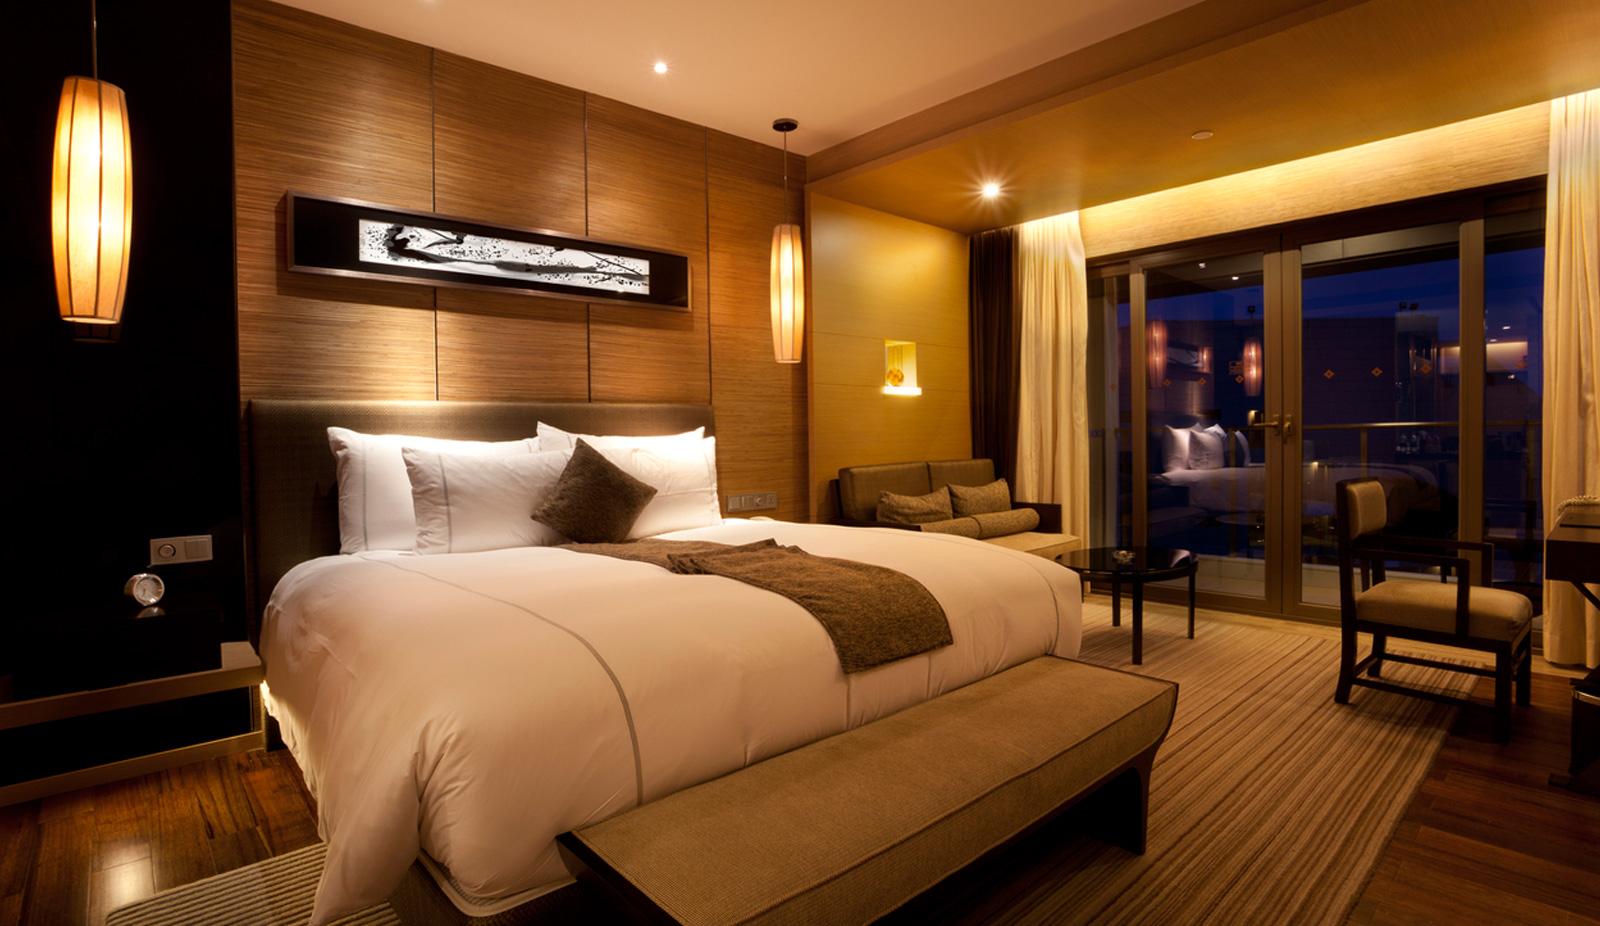 Luxury nighttime bedroom